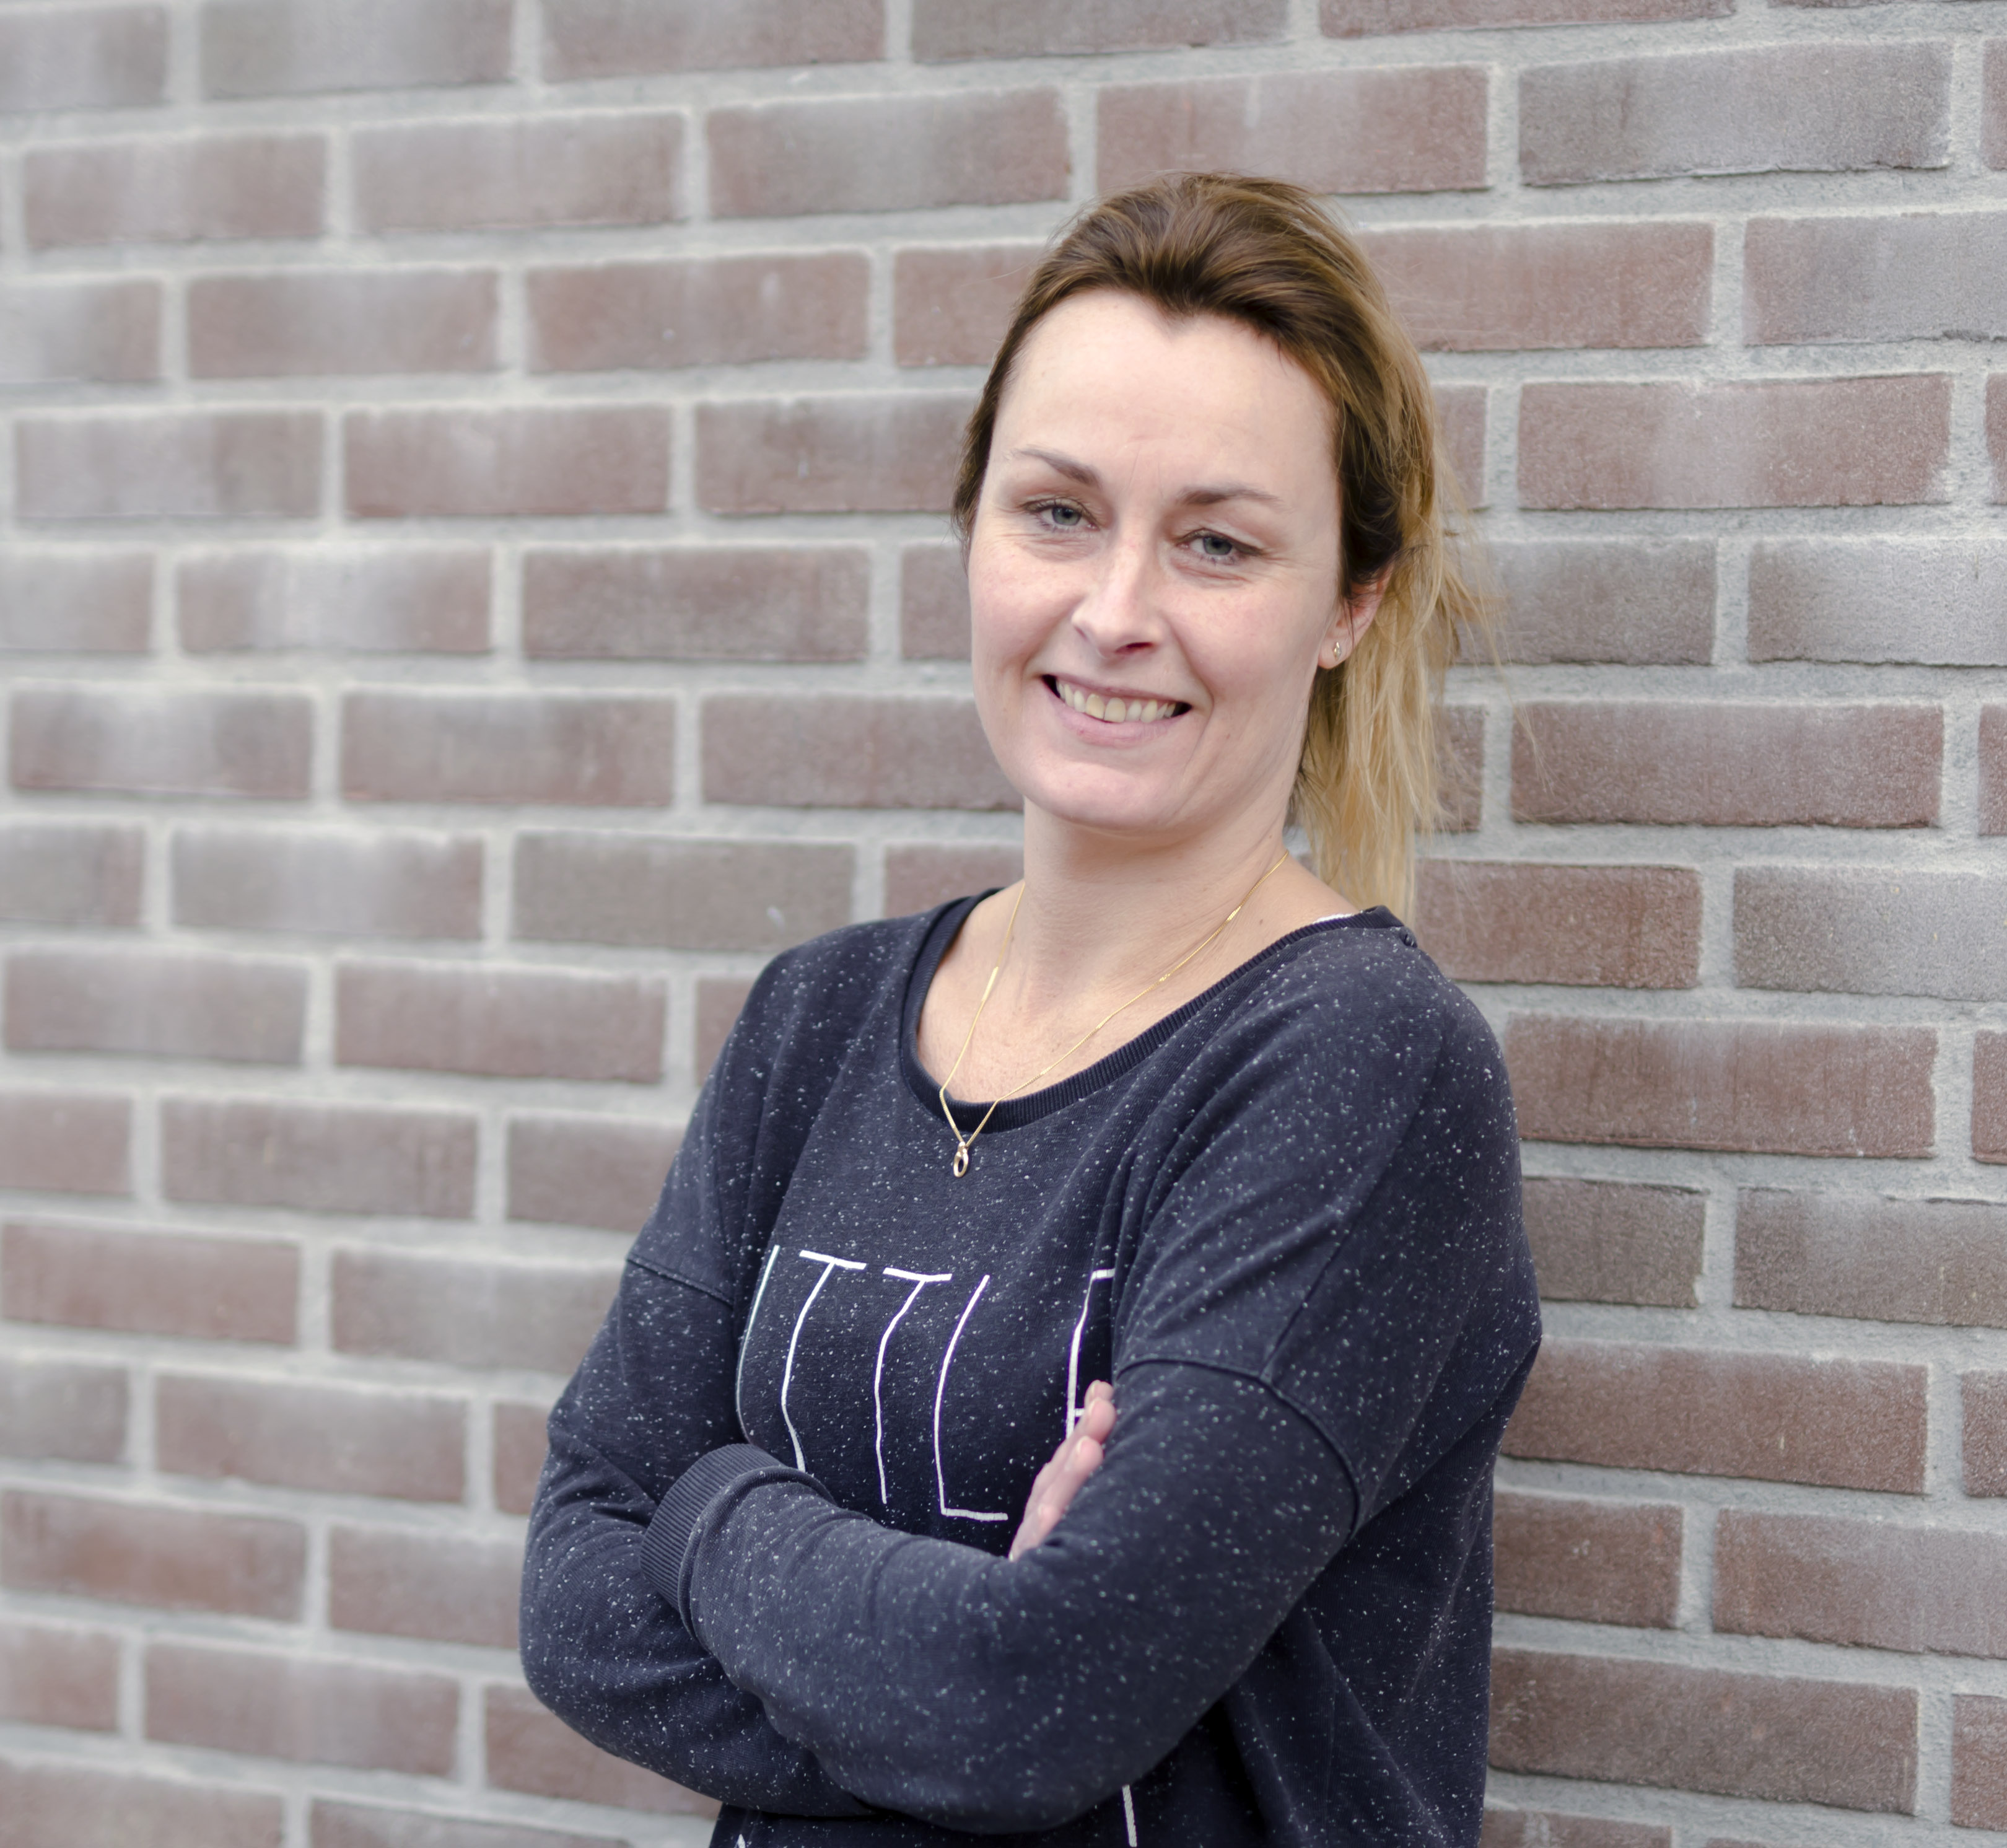 Jolanda Visser